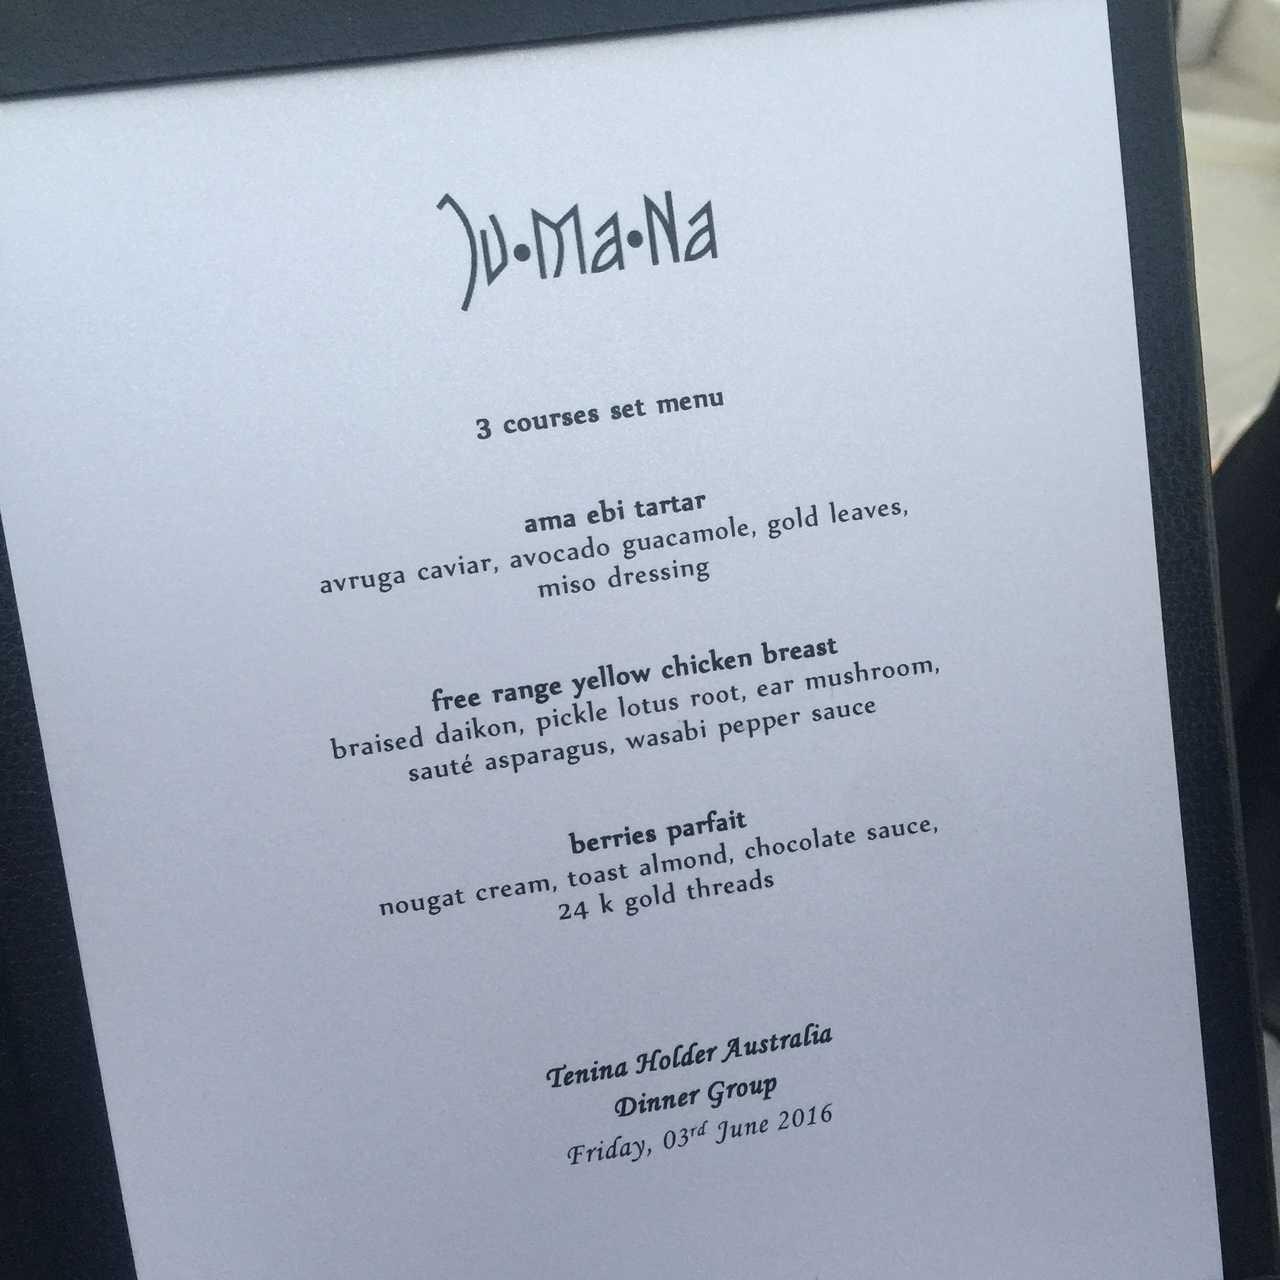 the-jumana-menu.JPG#asset:30756